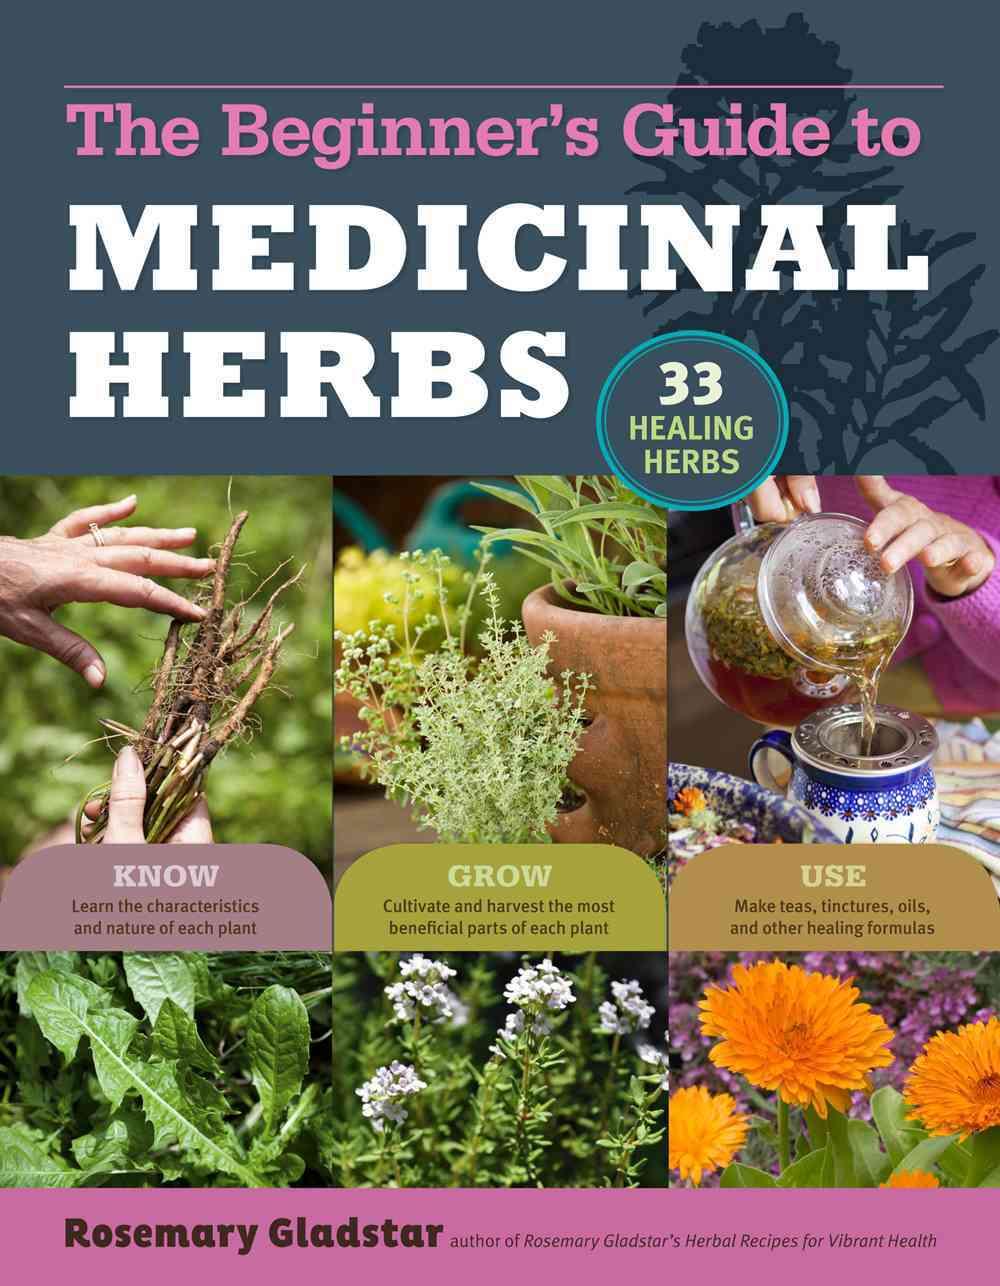 Rosemary Gladstar's Medicinal Herbs: a Beginner's Guide By Gladstar, Rosemary